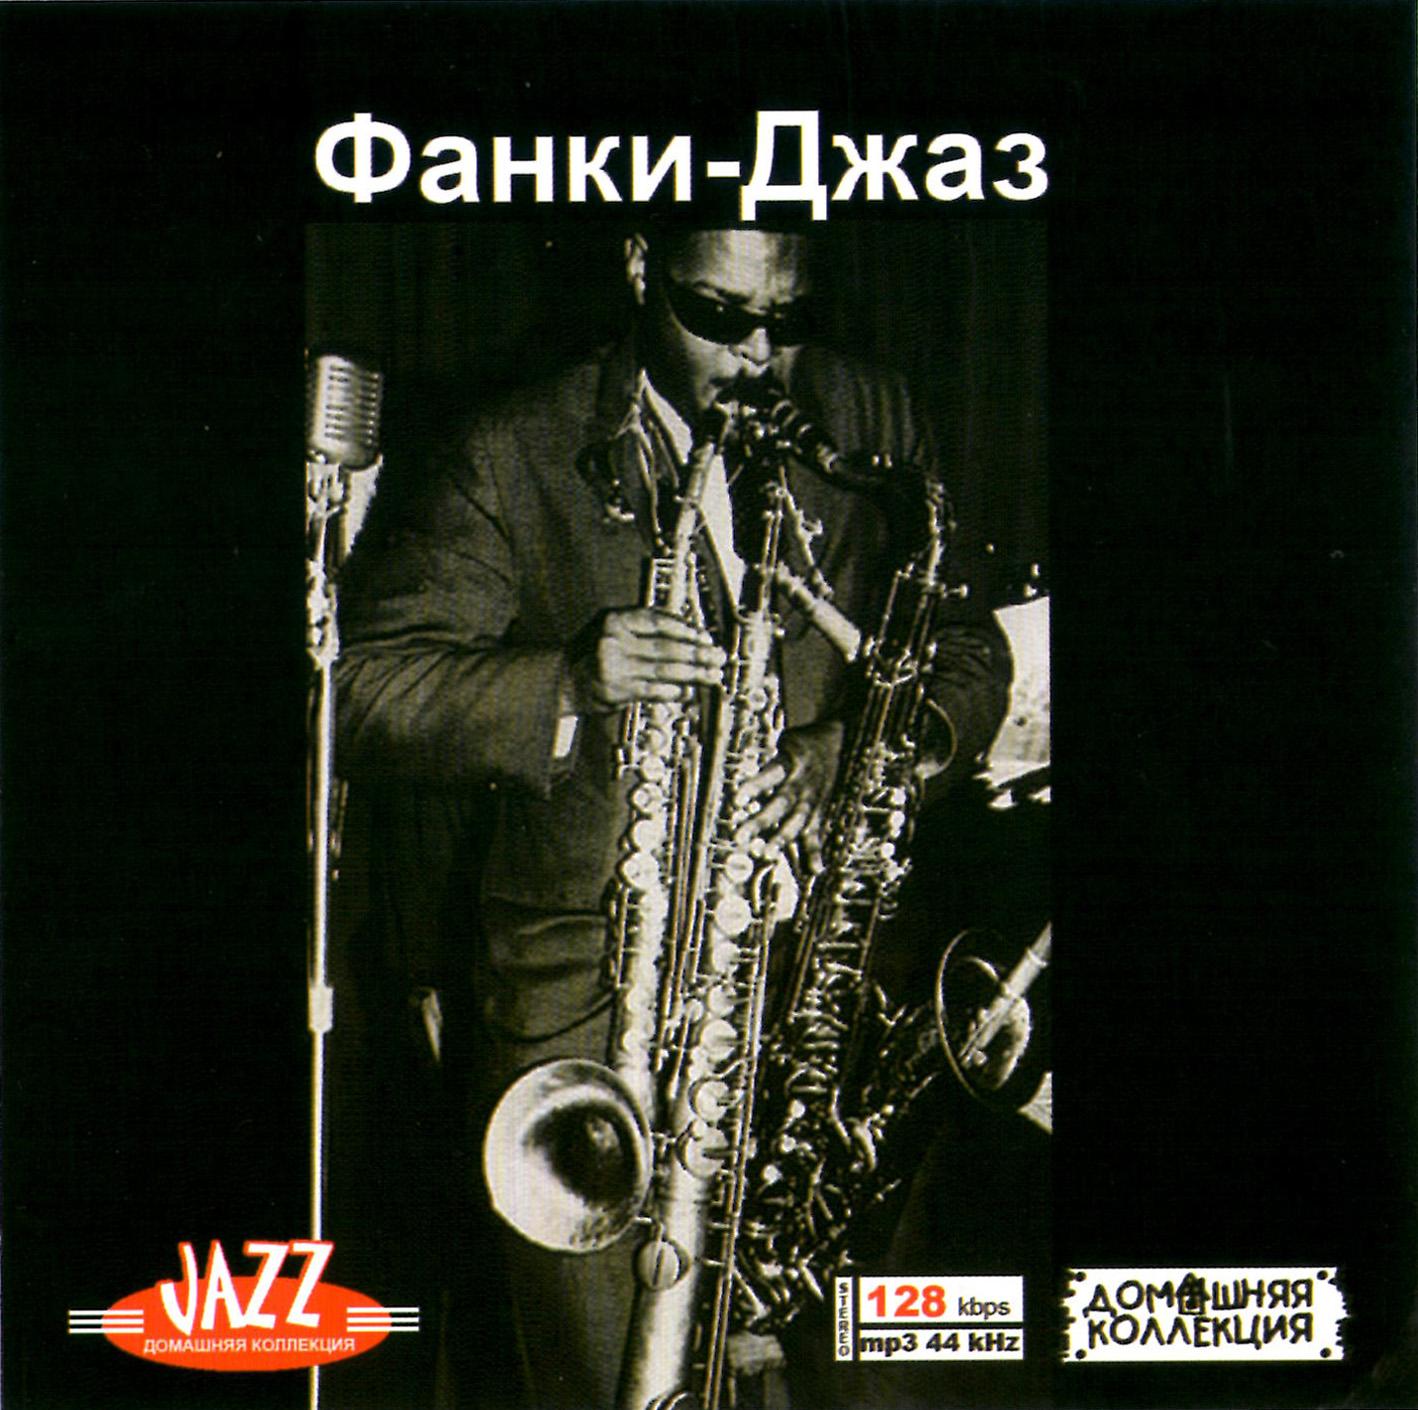 Фанки - джаз [mp3]